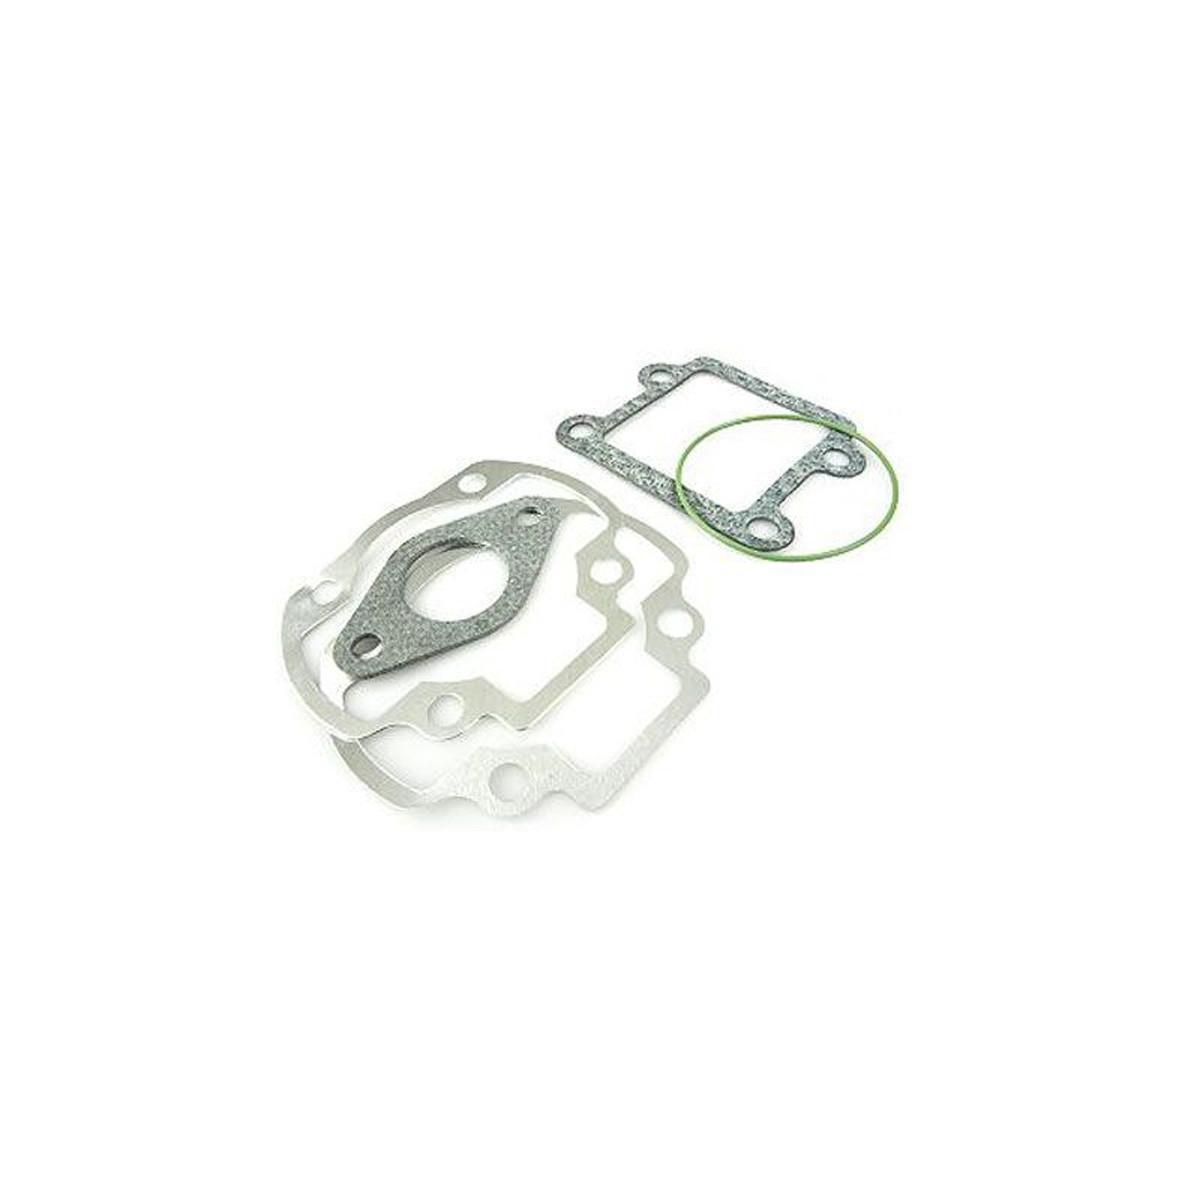 Pochette Joints MBK Booster - YAMAHA Bw's 70cc - POLINI